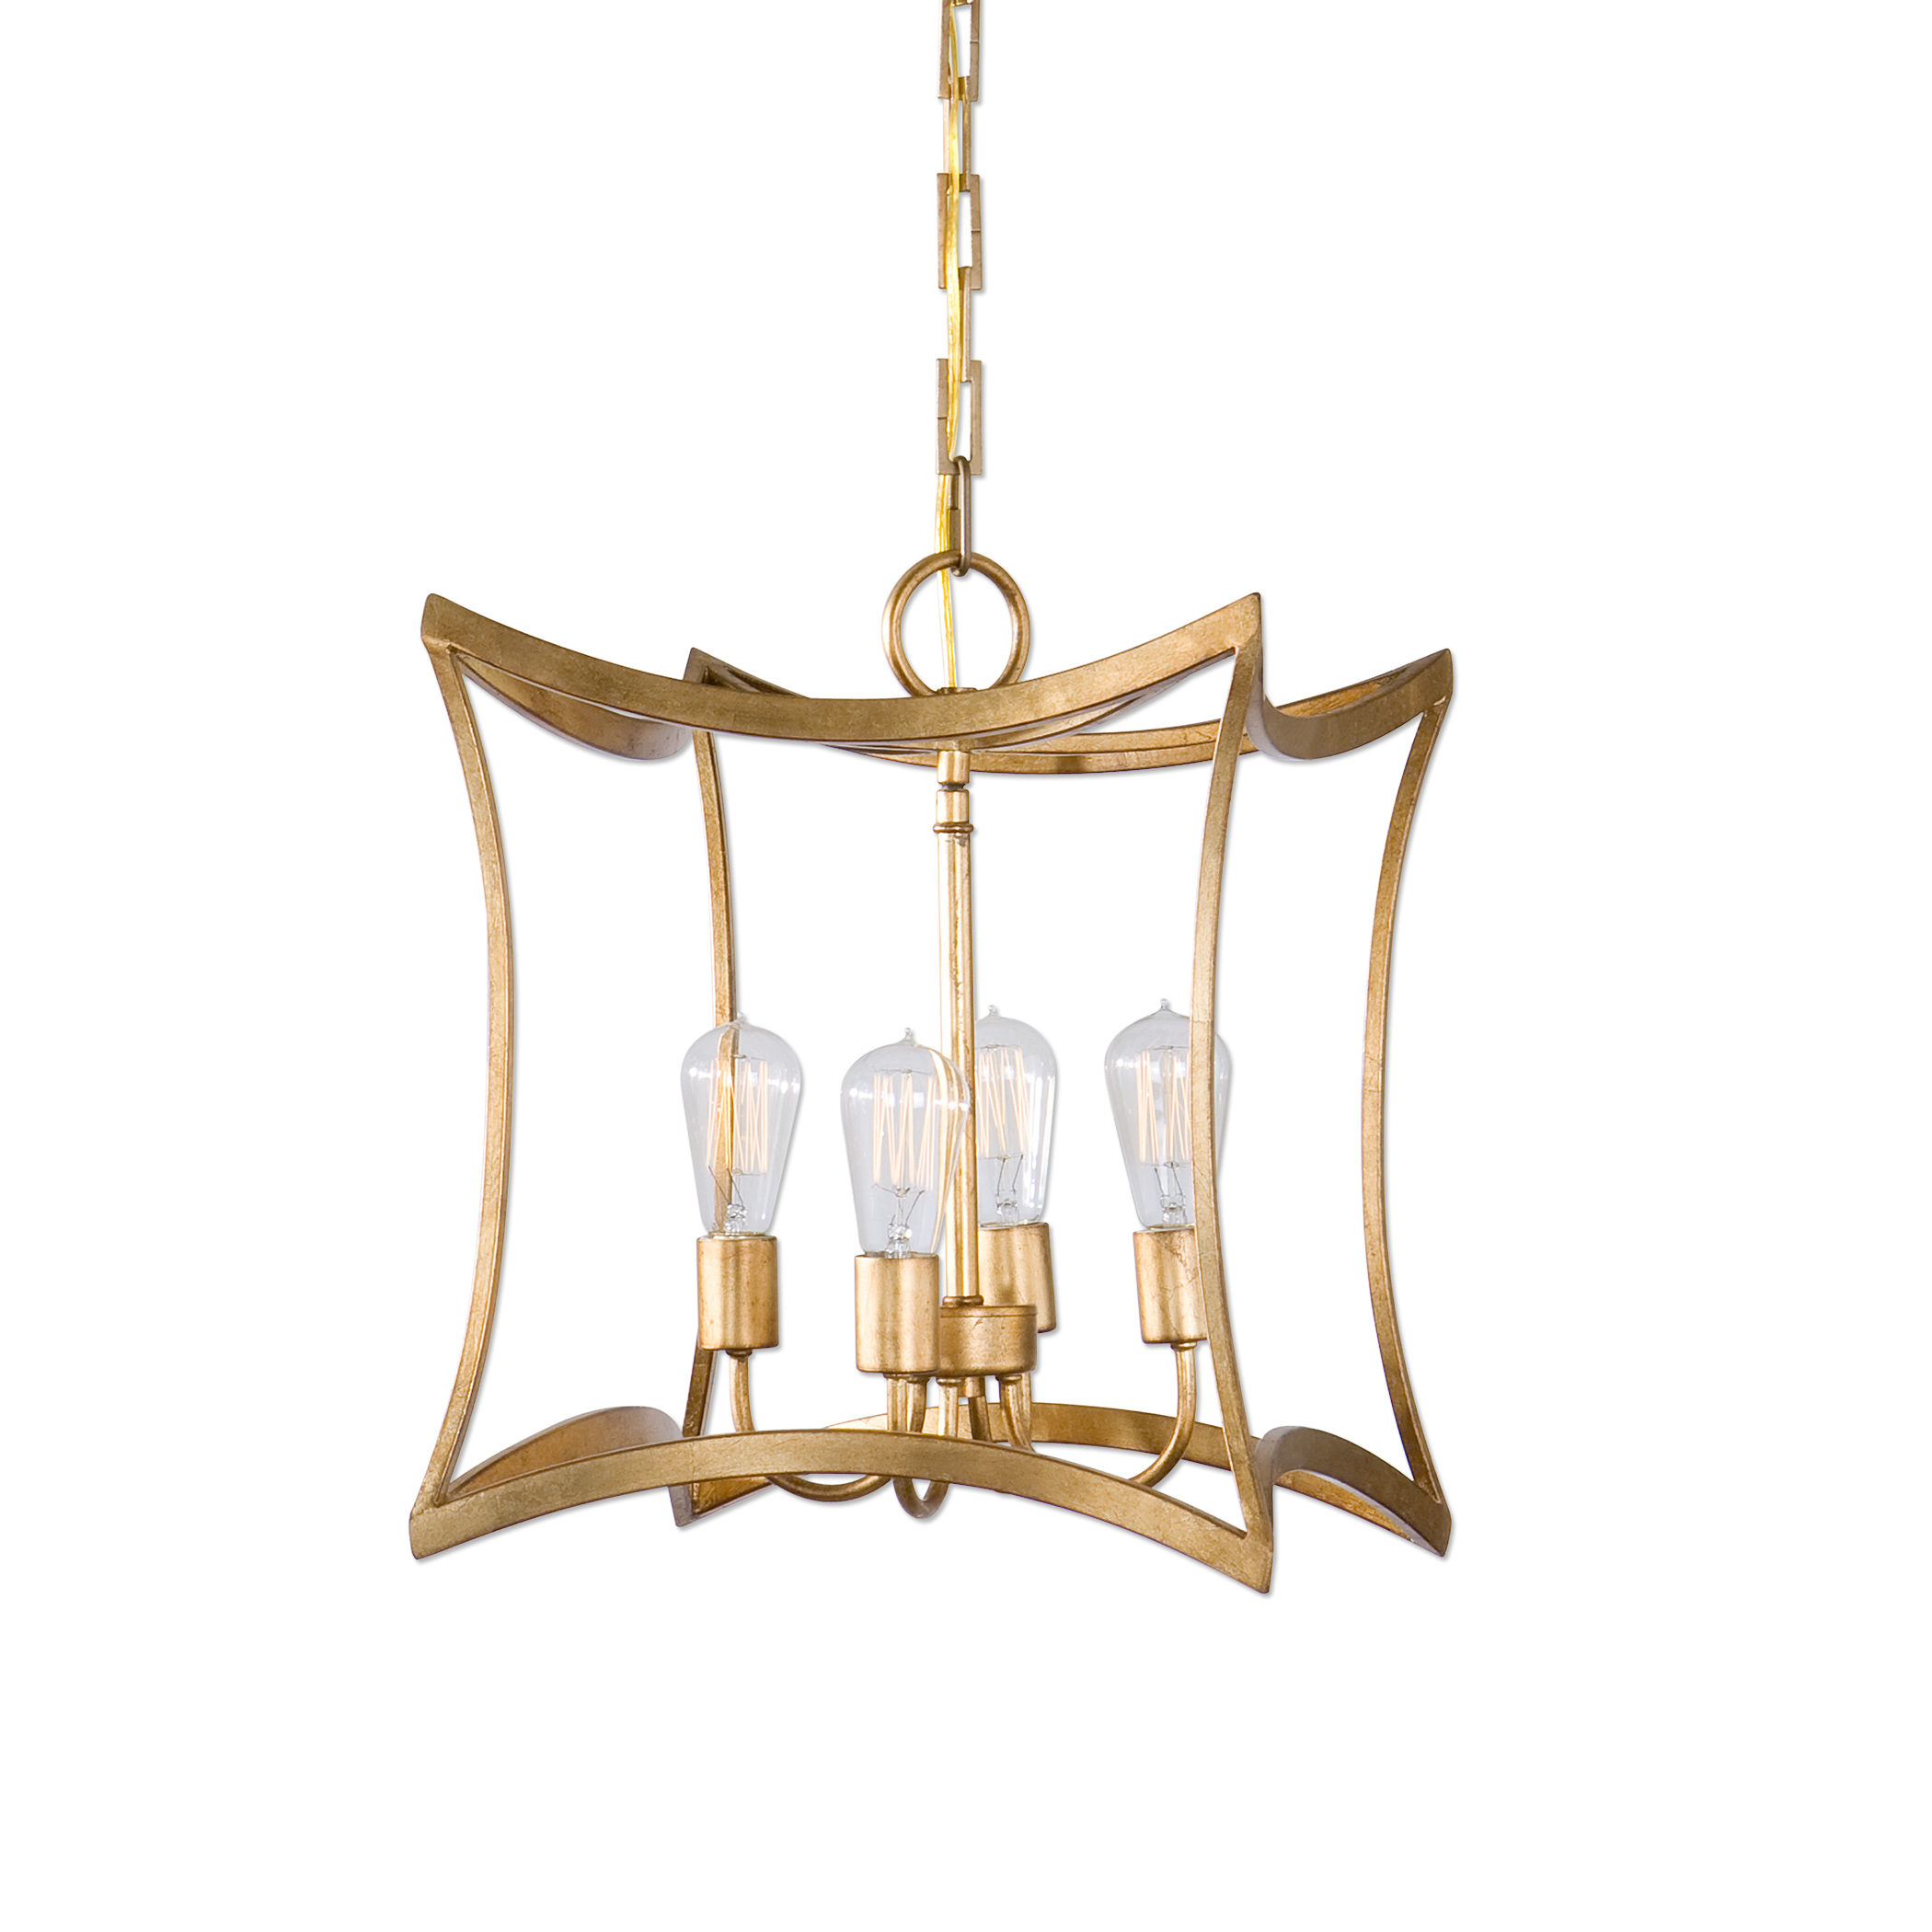 Uttermost Lighting Fixtures Dore 4 Light Lantern Pendant - Item Number: 22074